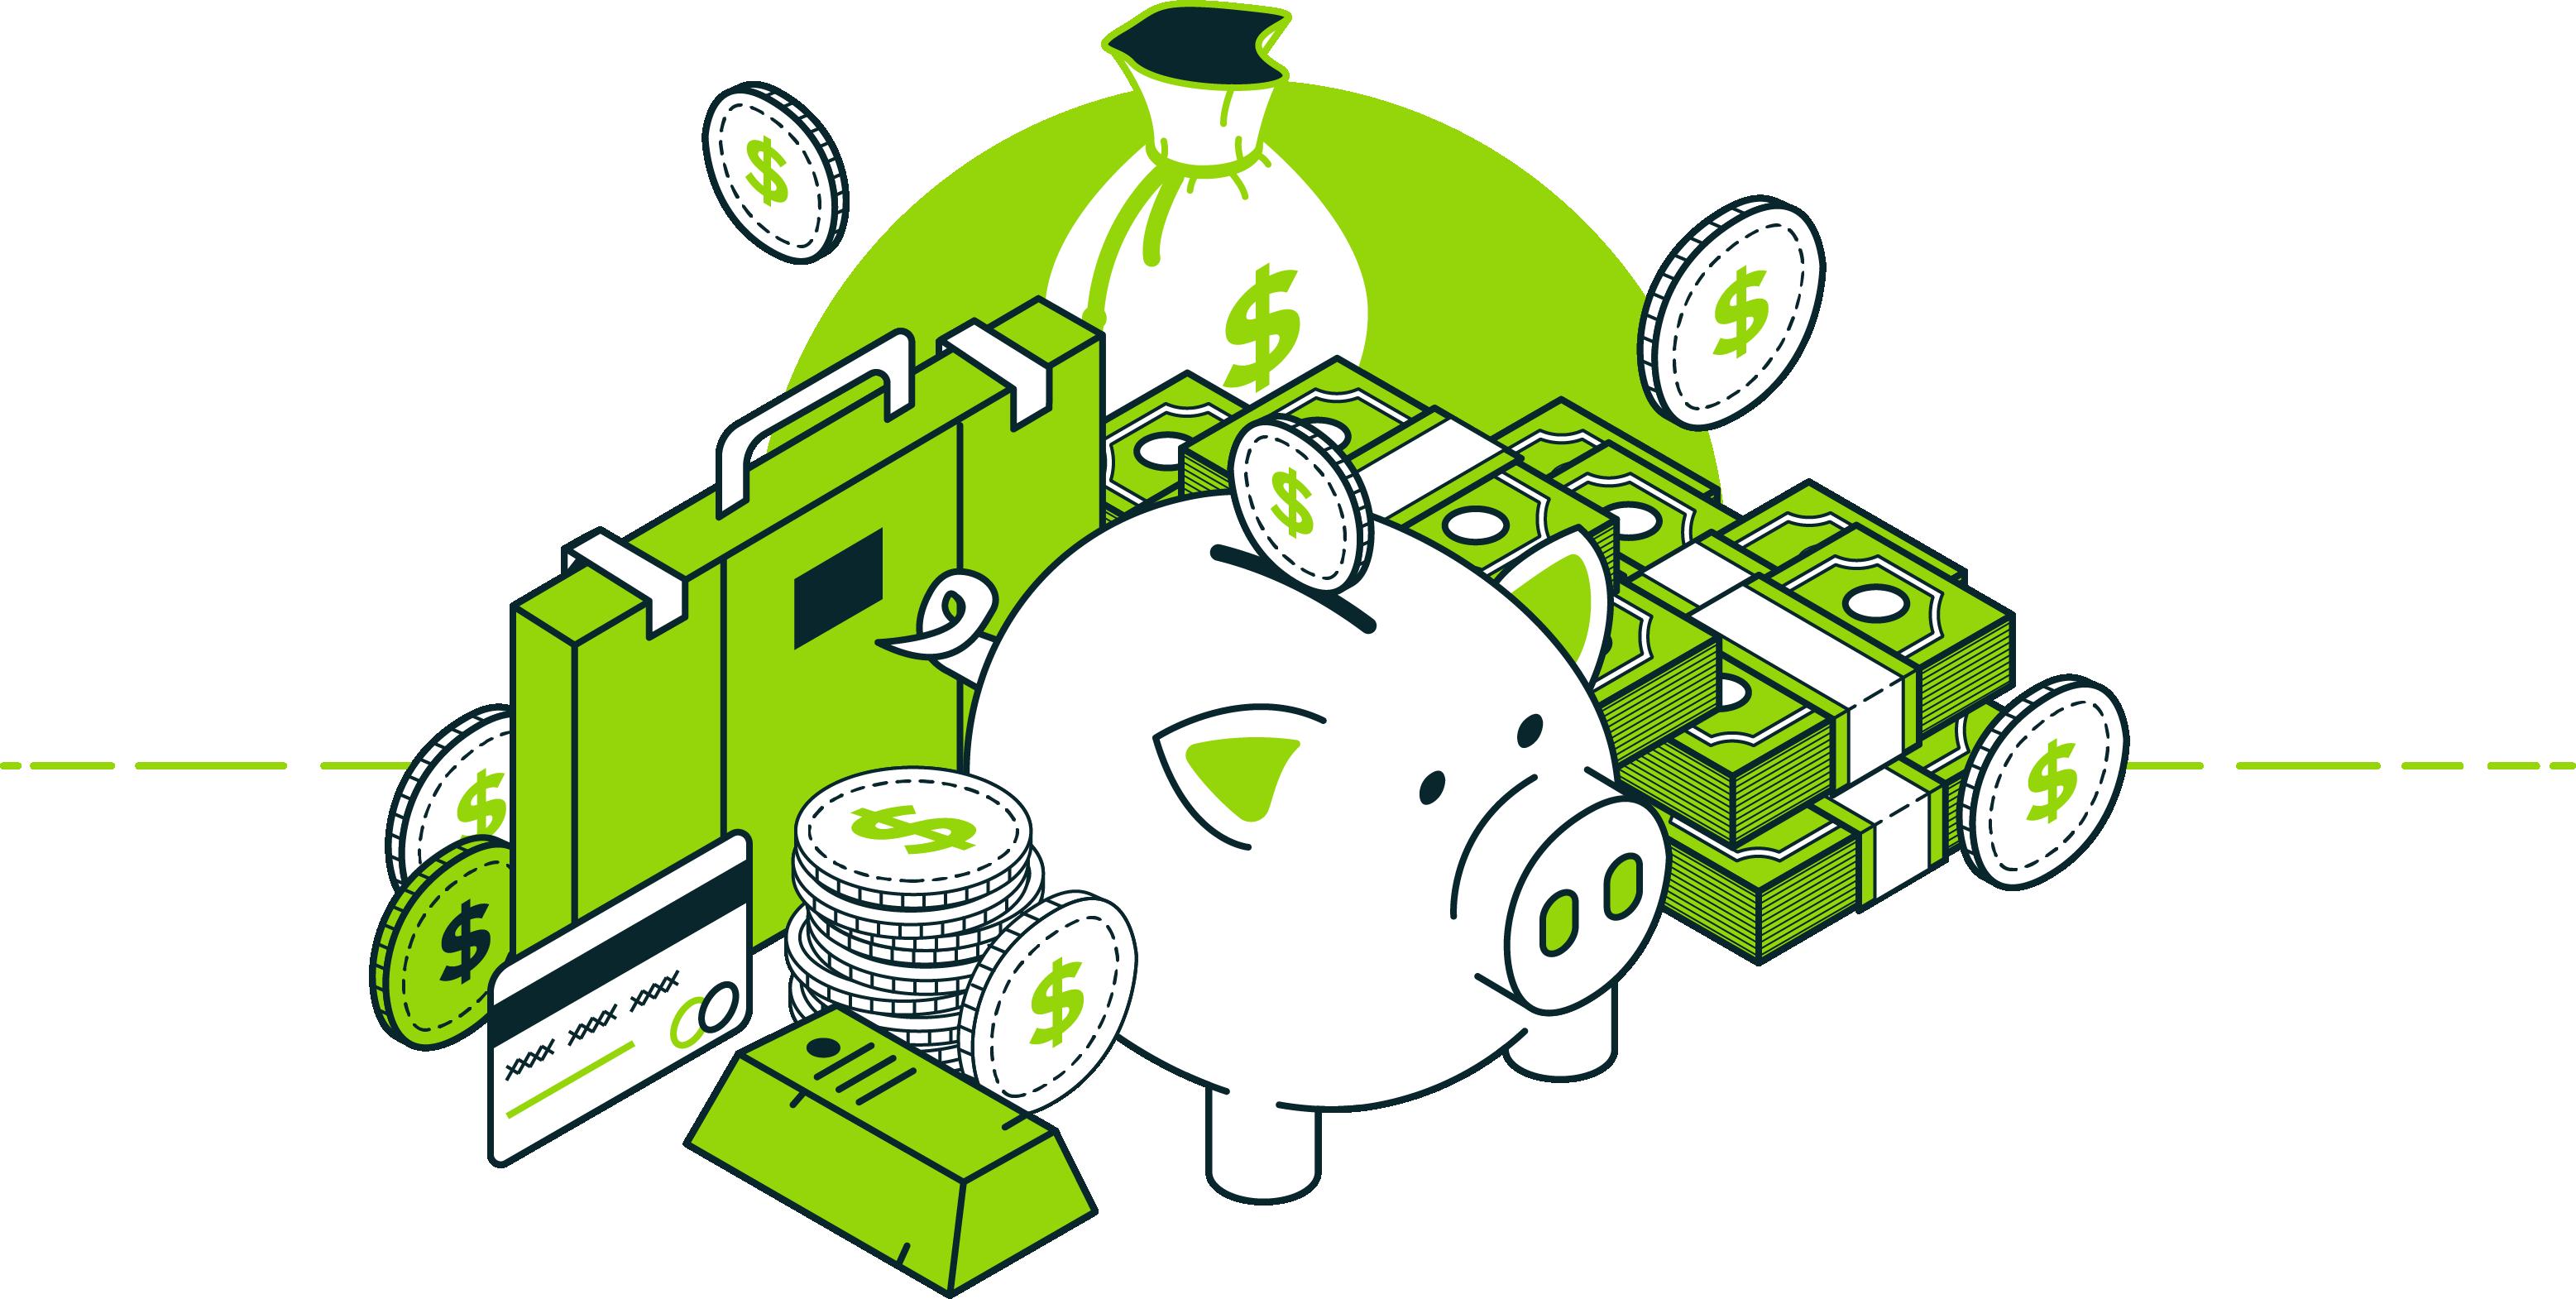 Money Recovered Illustration